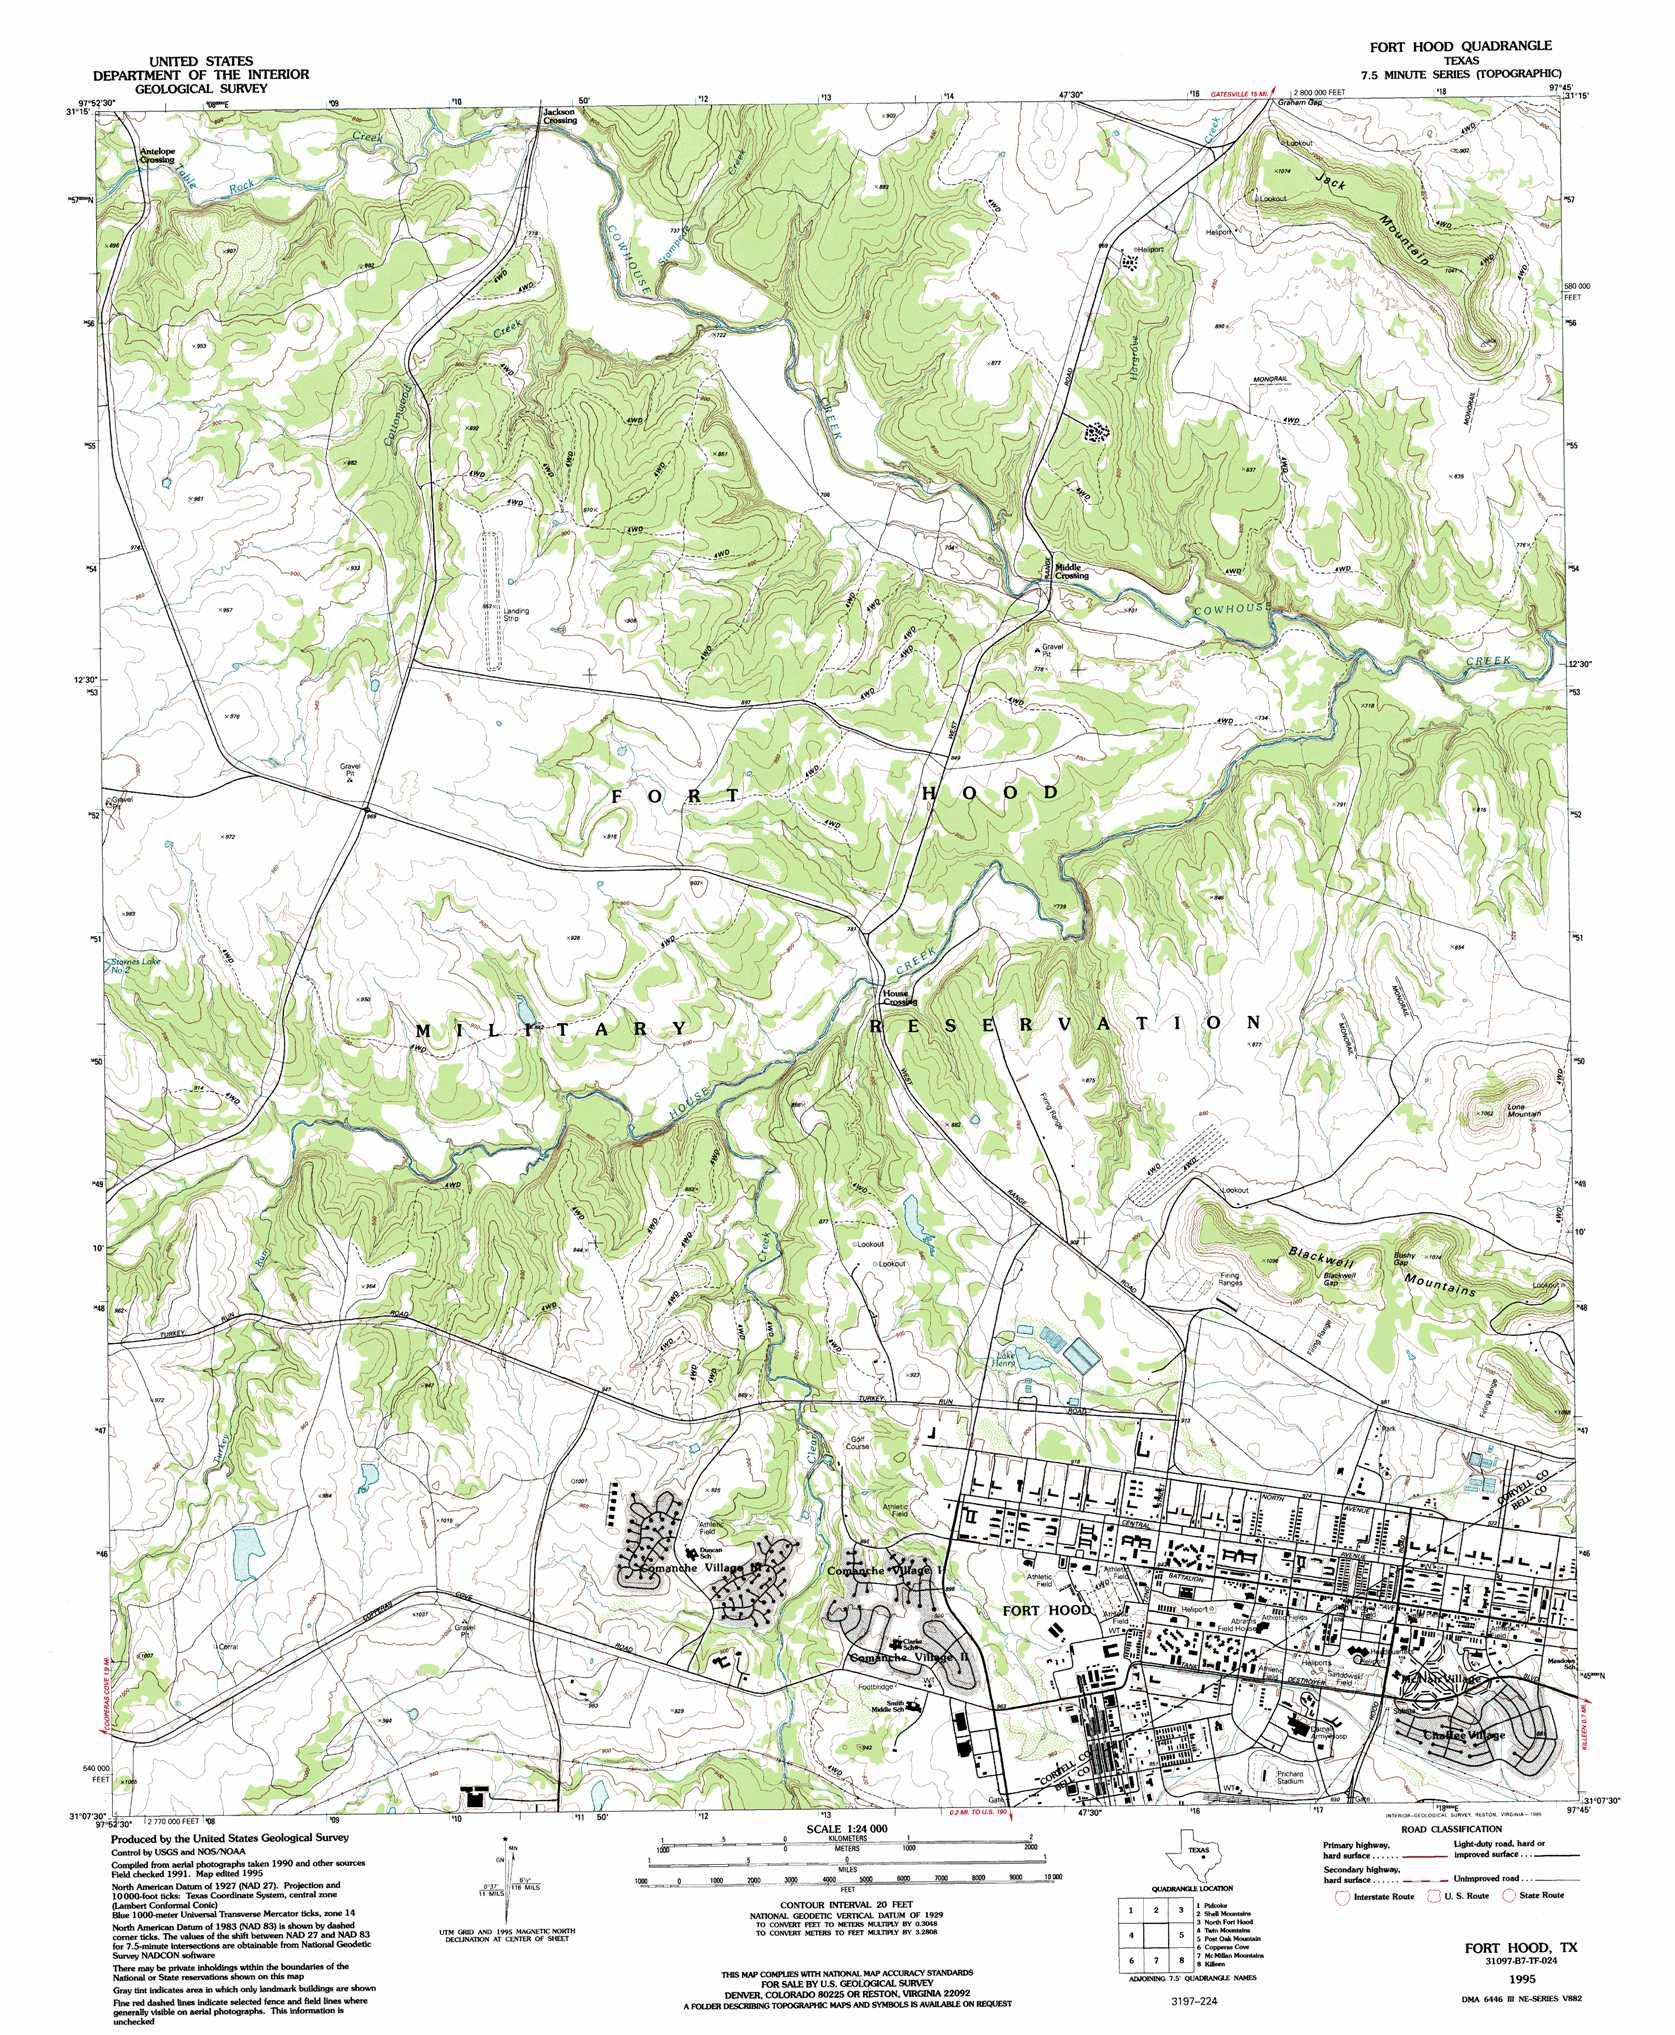 Fort Hood topographic map, TX   USGS Topo Quad 31097b7